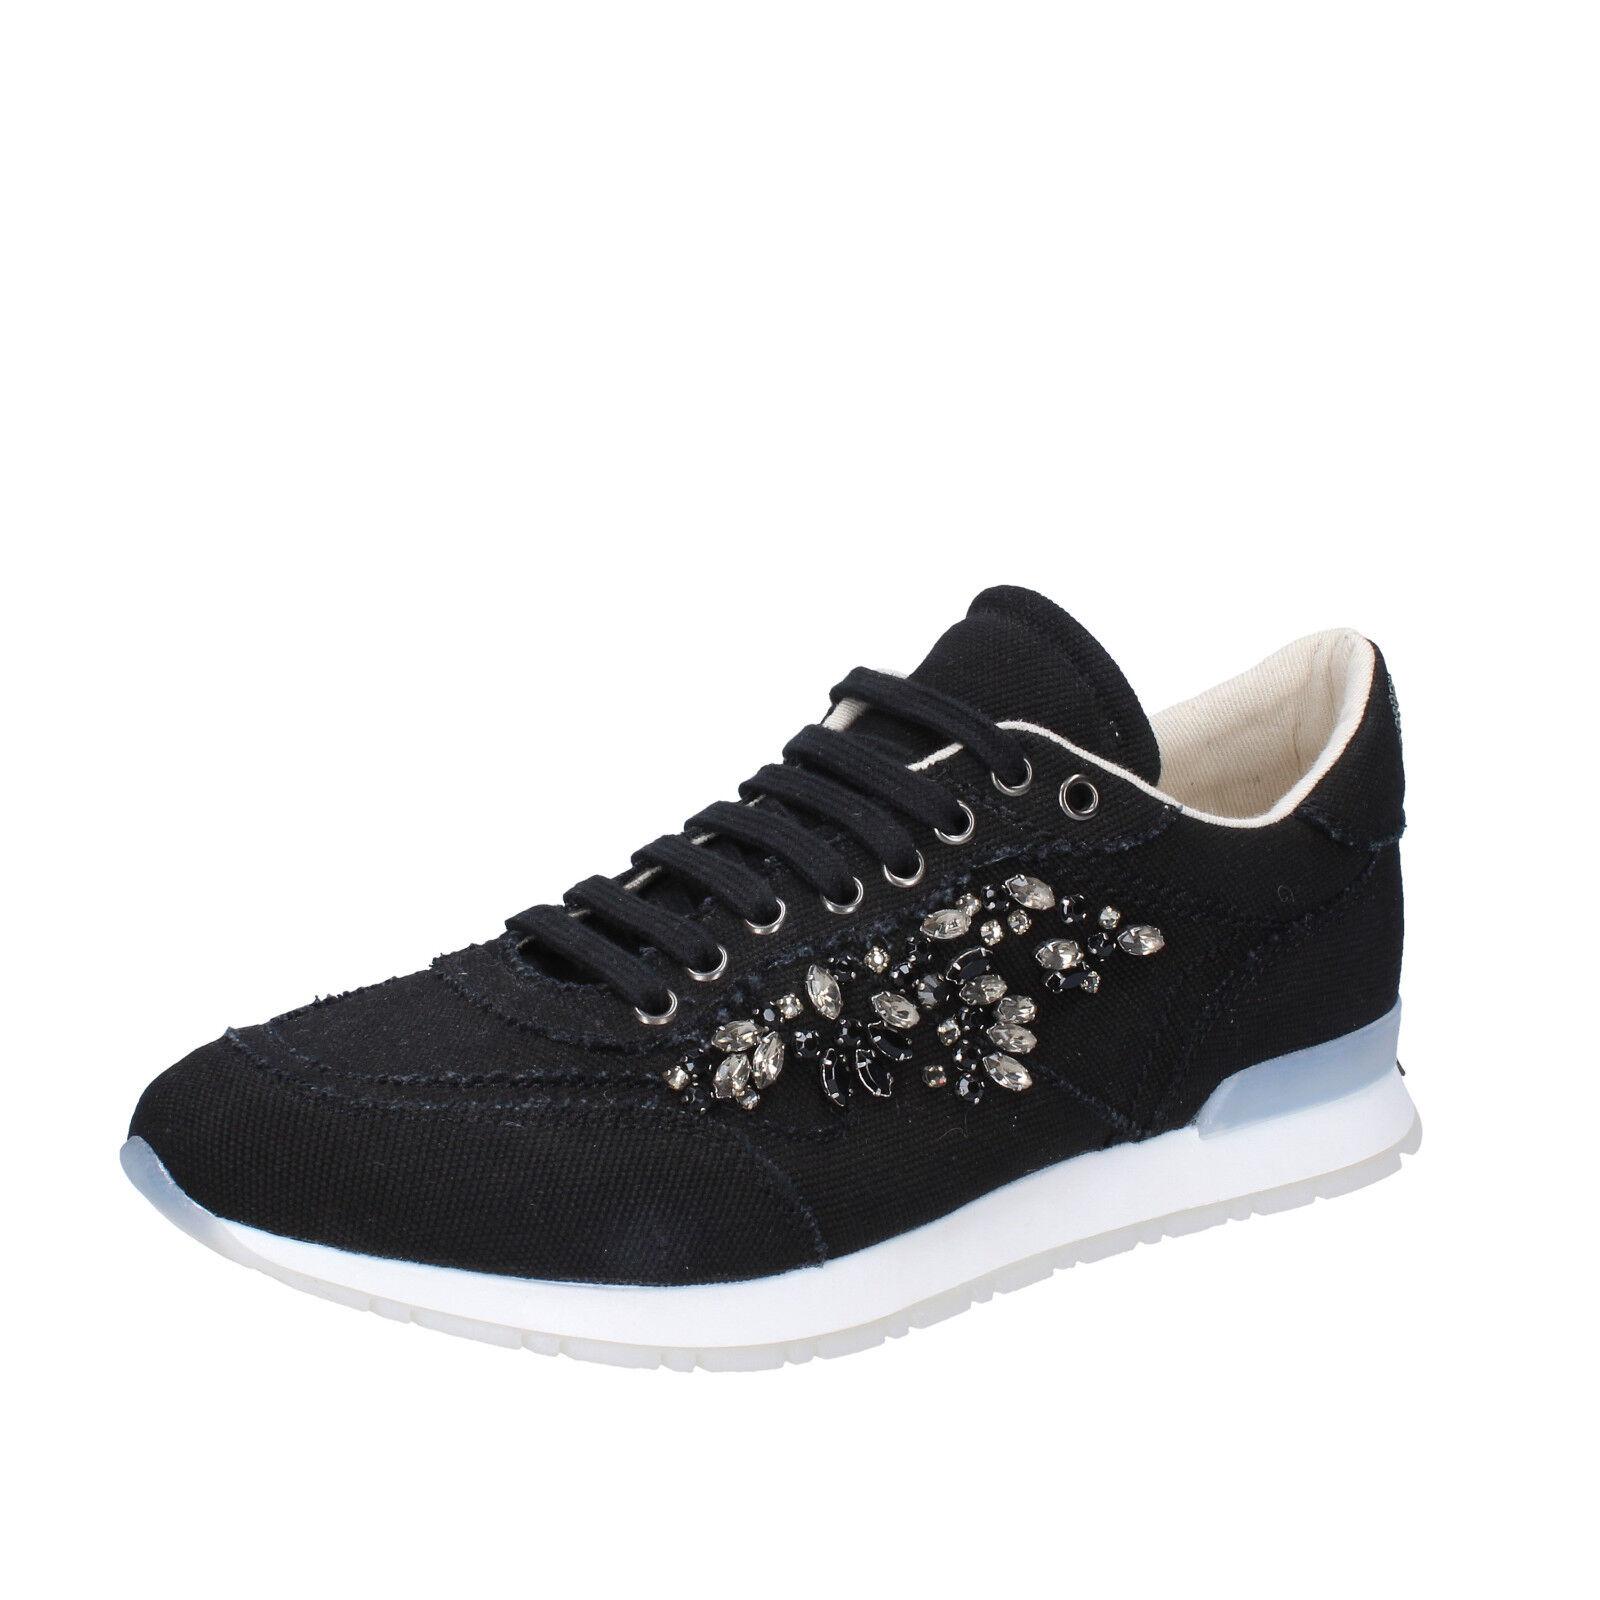 scarpe donna TWIN-SET nero SIMONA BARBIERI 39 EU sneakers nero TWIN-SET tessuto AB889-C bacb24